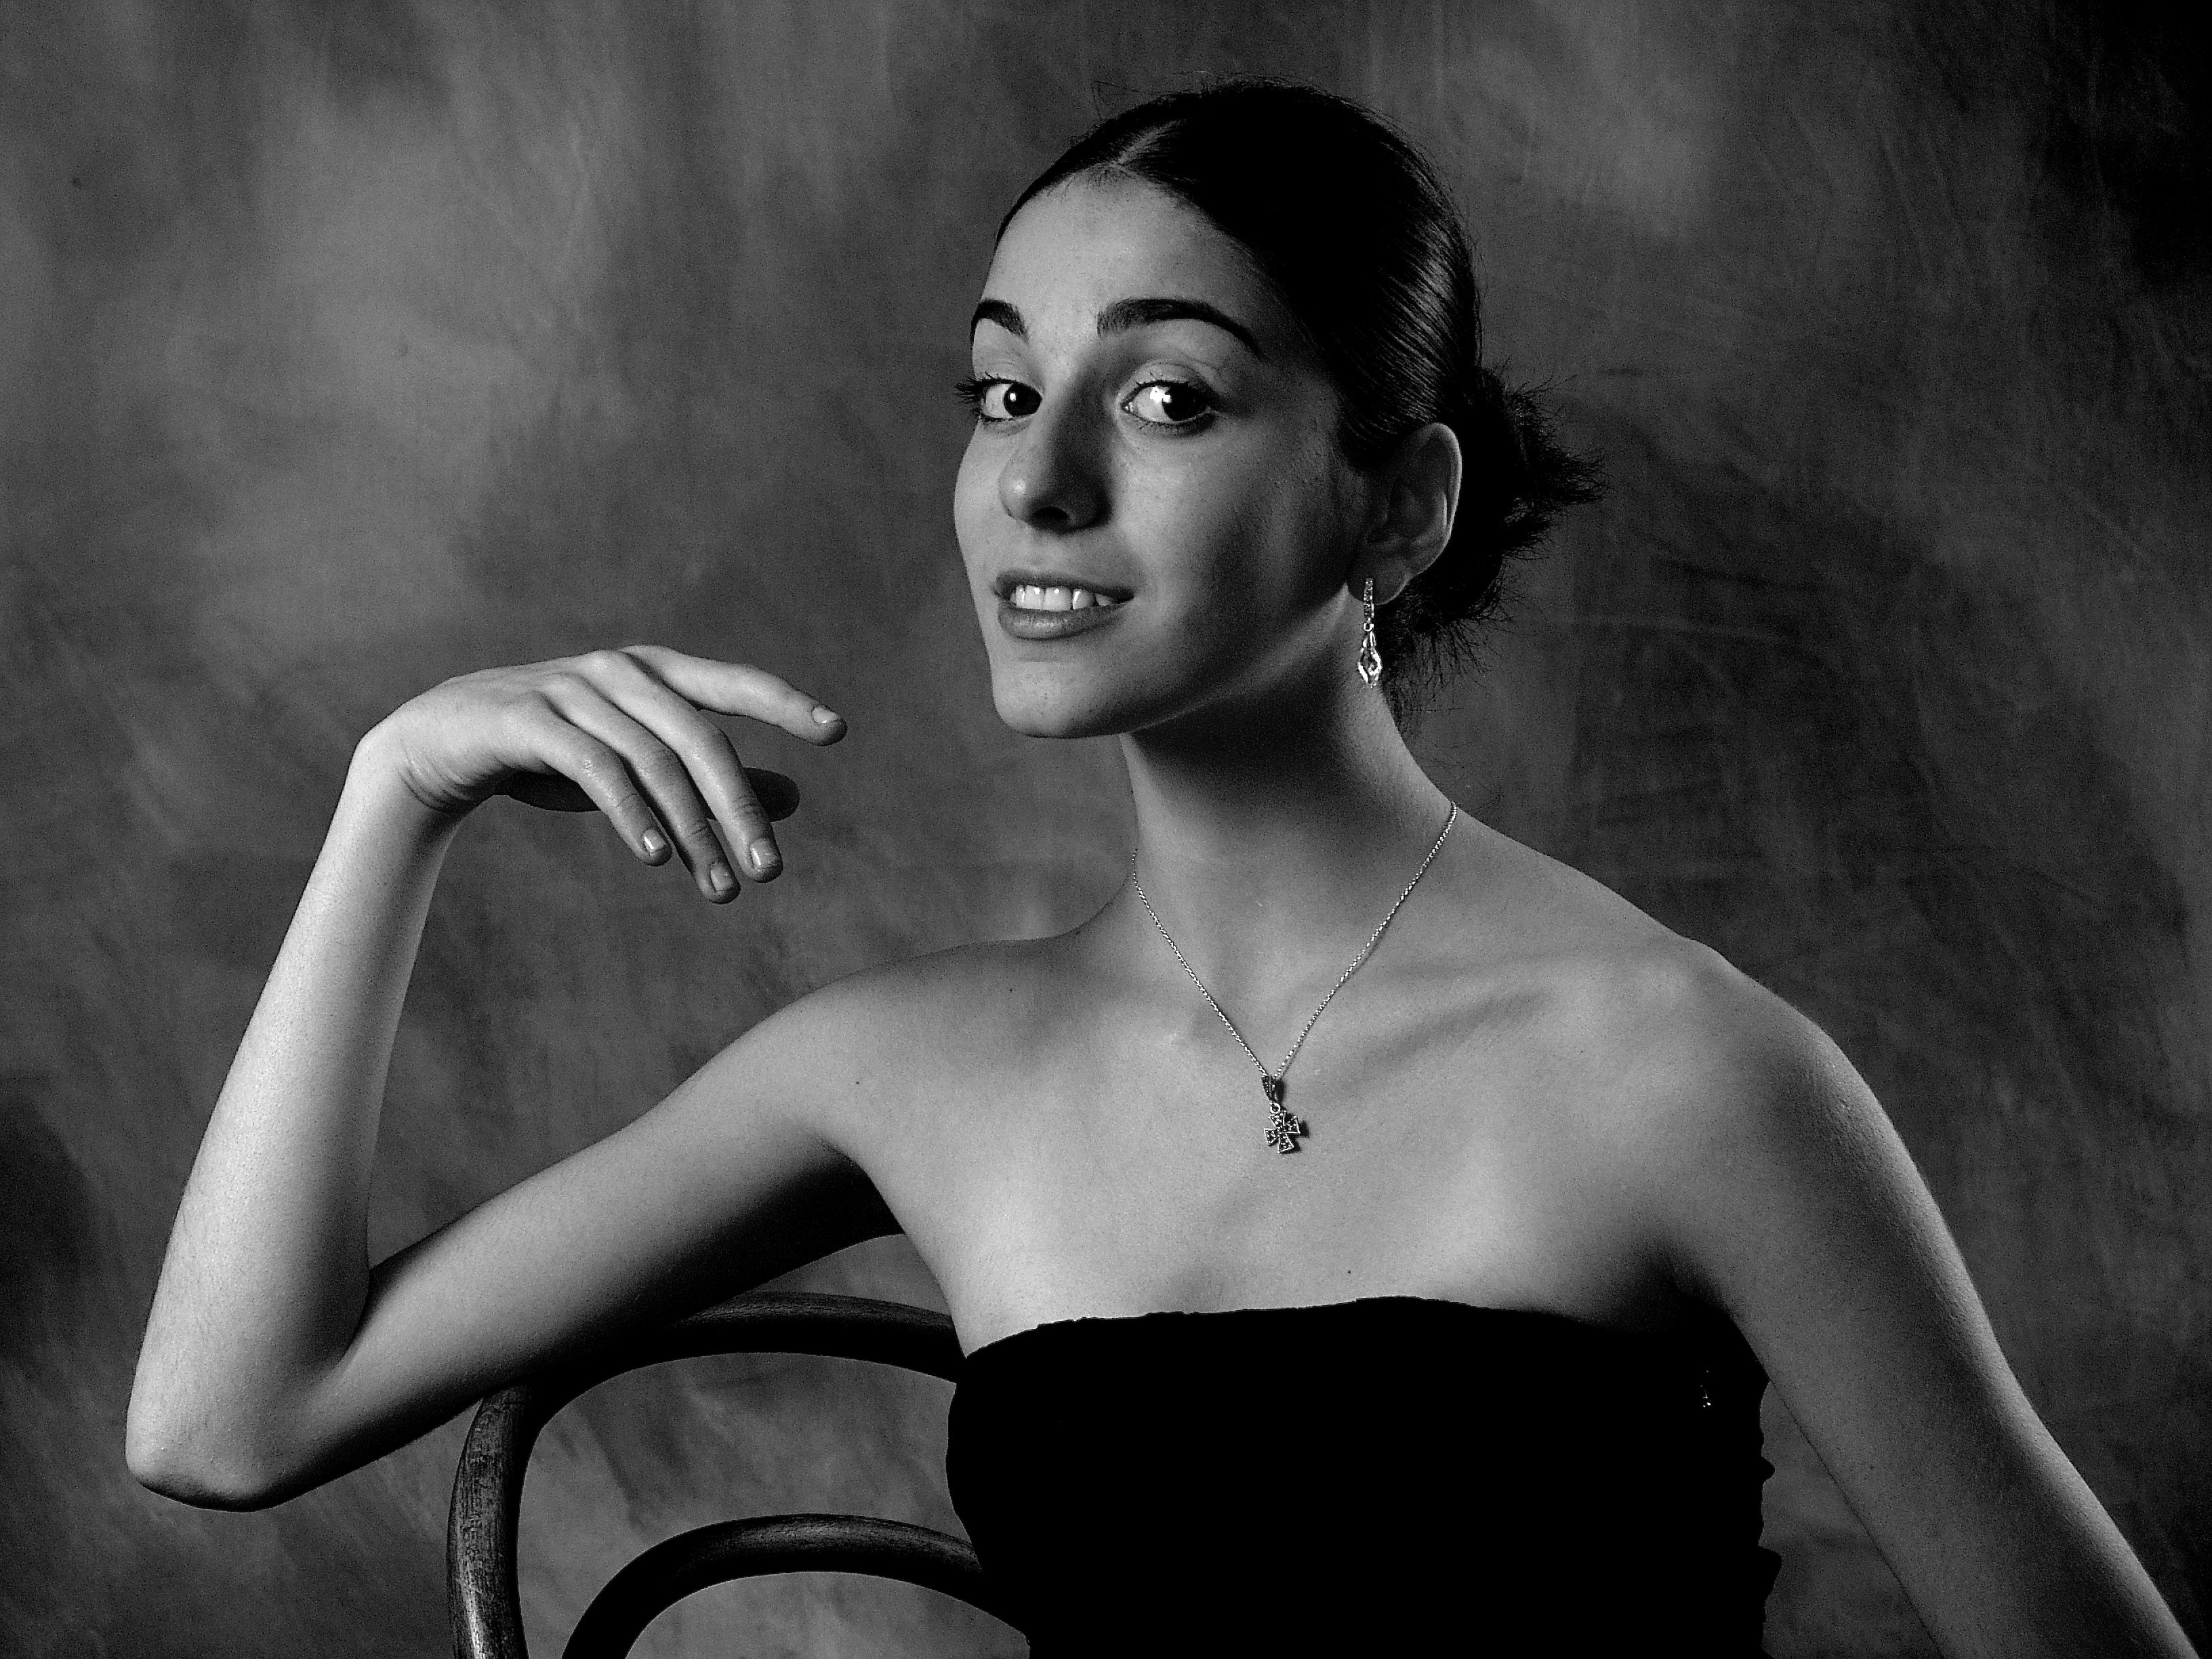 Ana Lejava